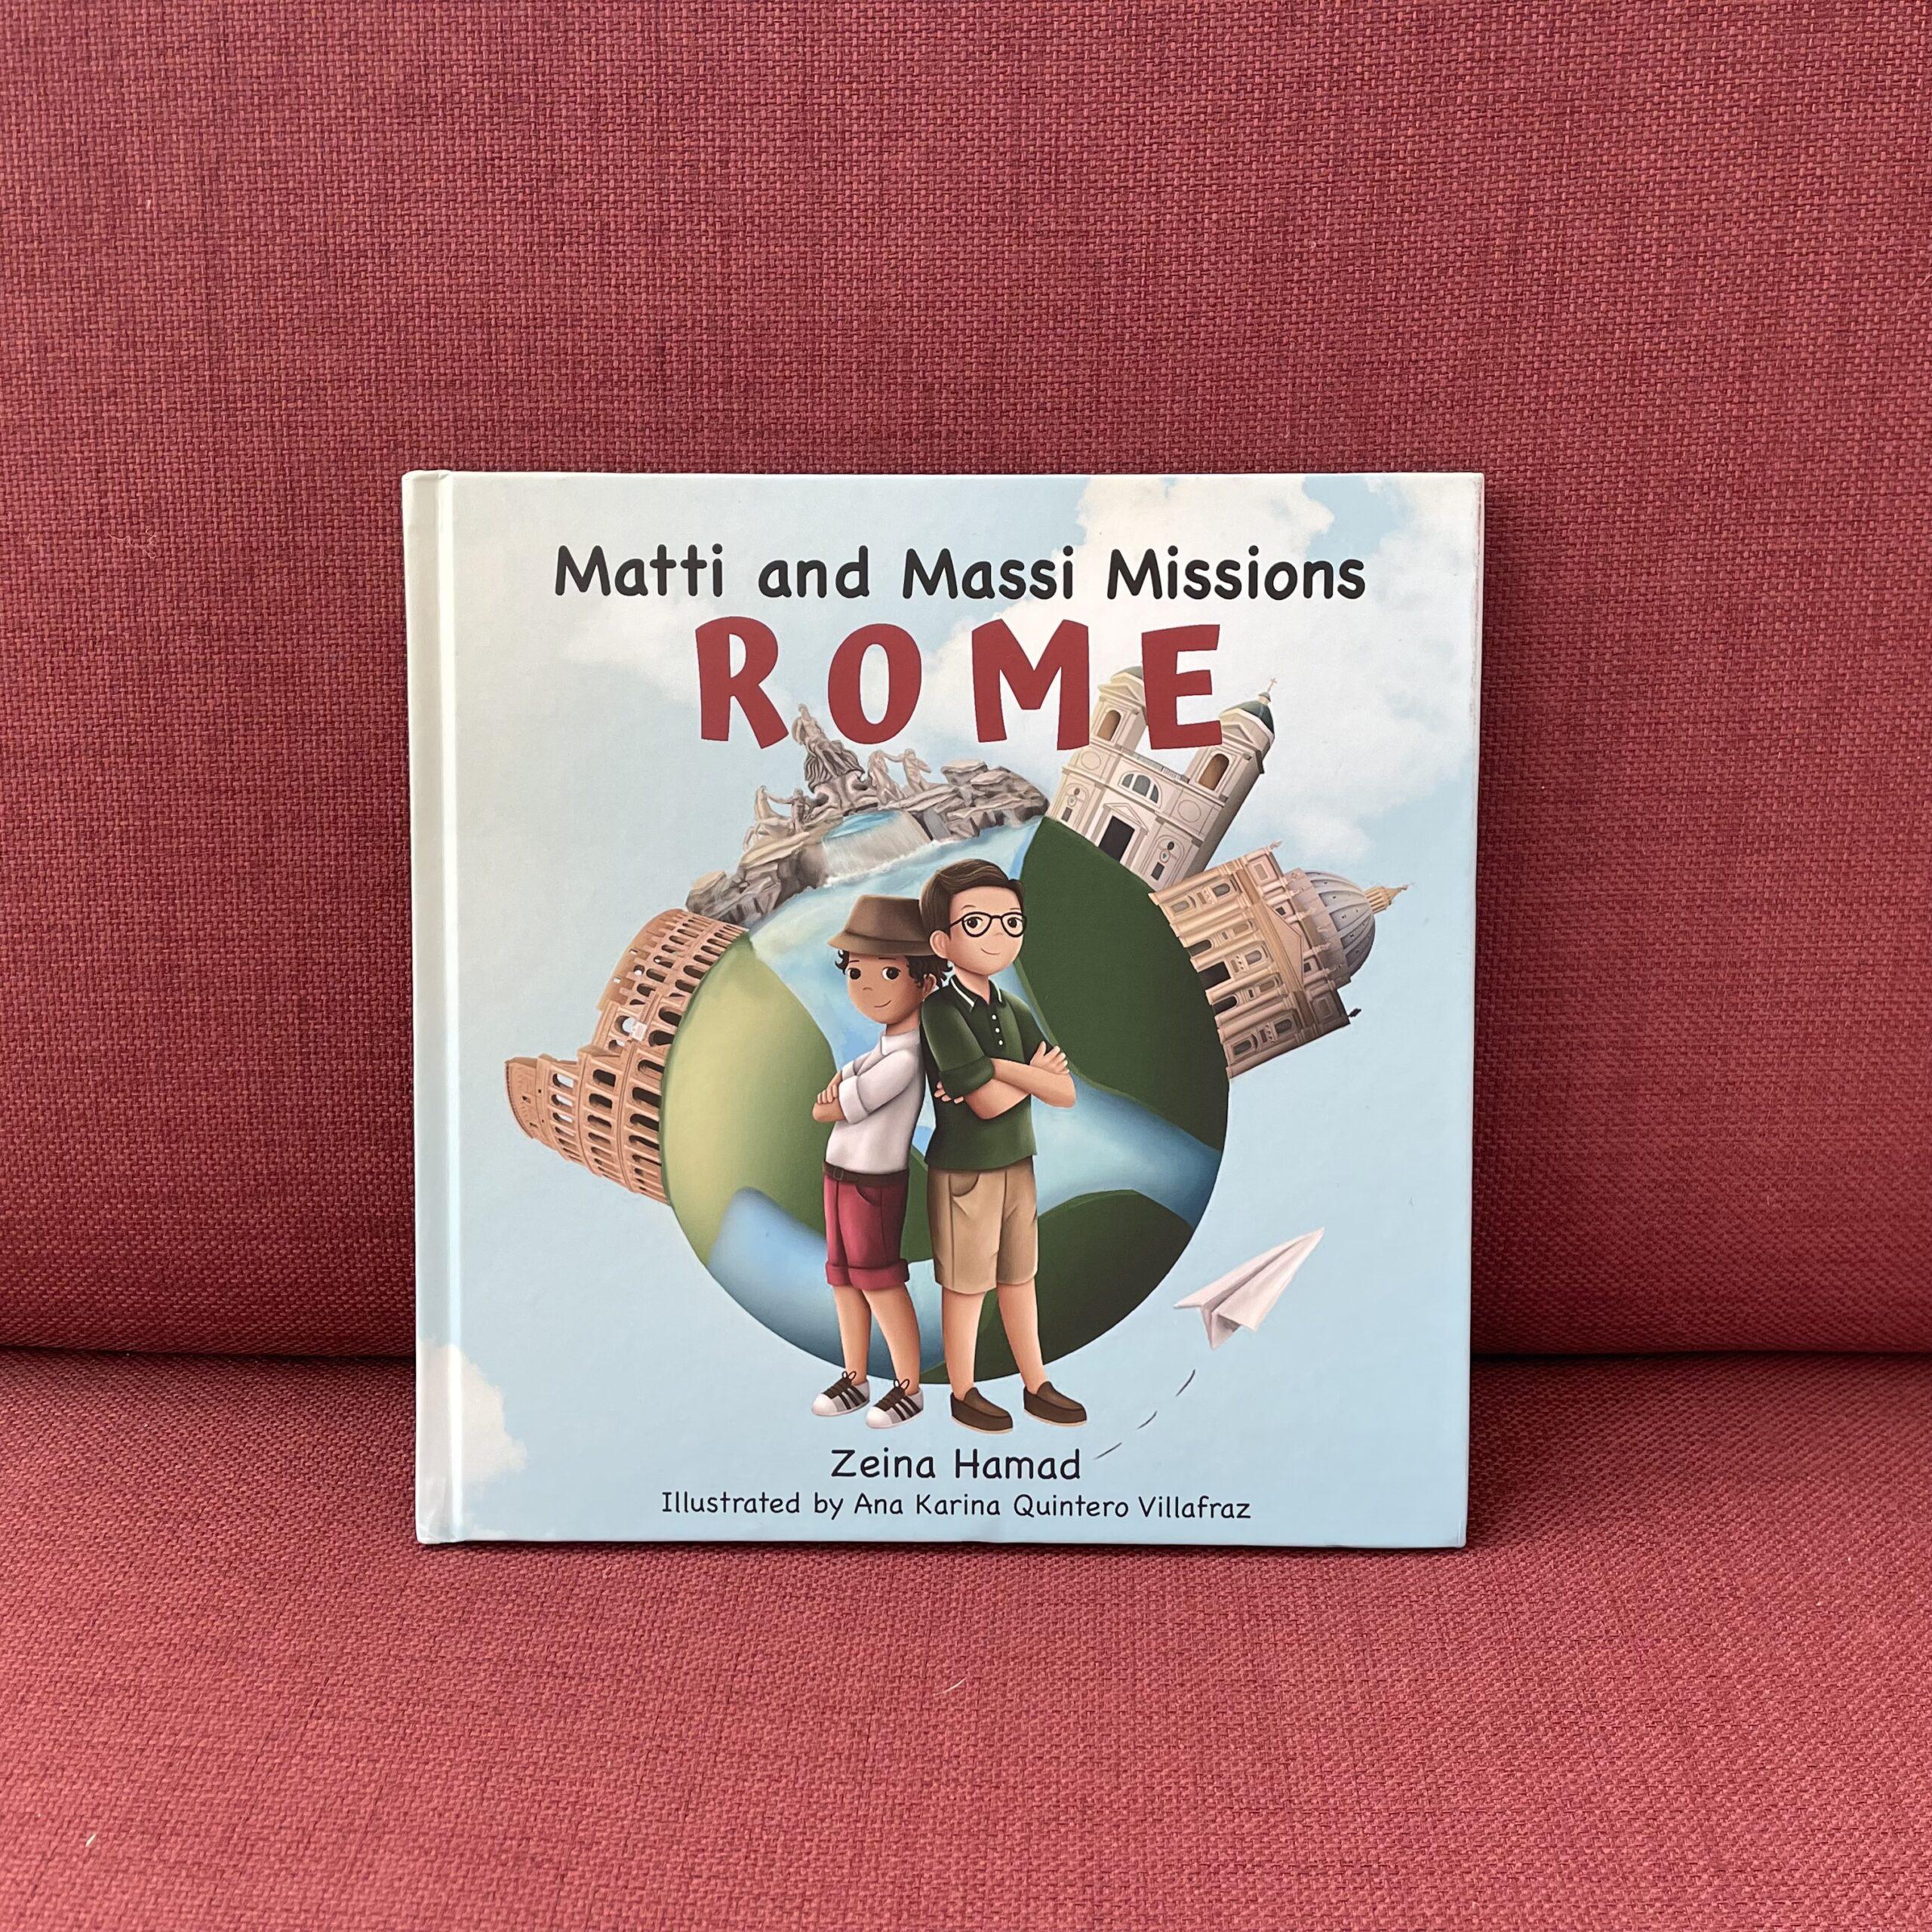 matti and massi missions, writing, children's books, picture books, new book, reading, kid's lit